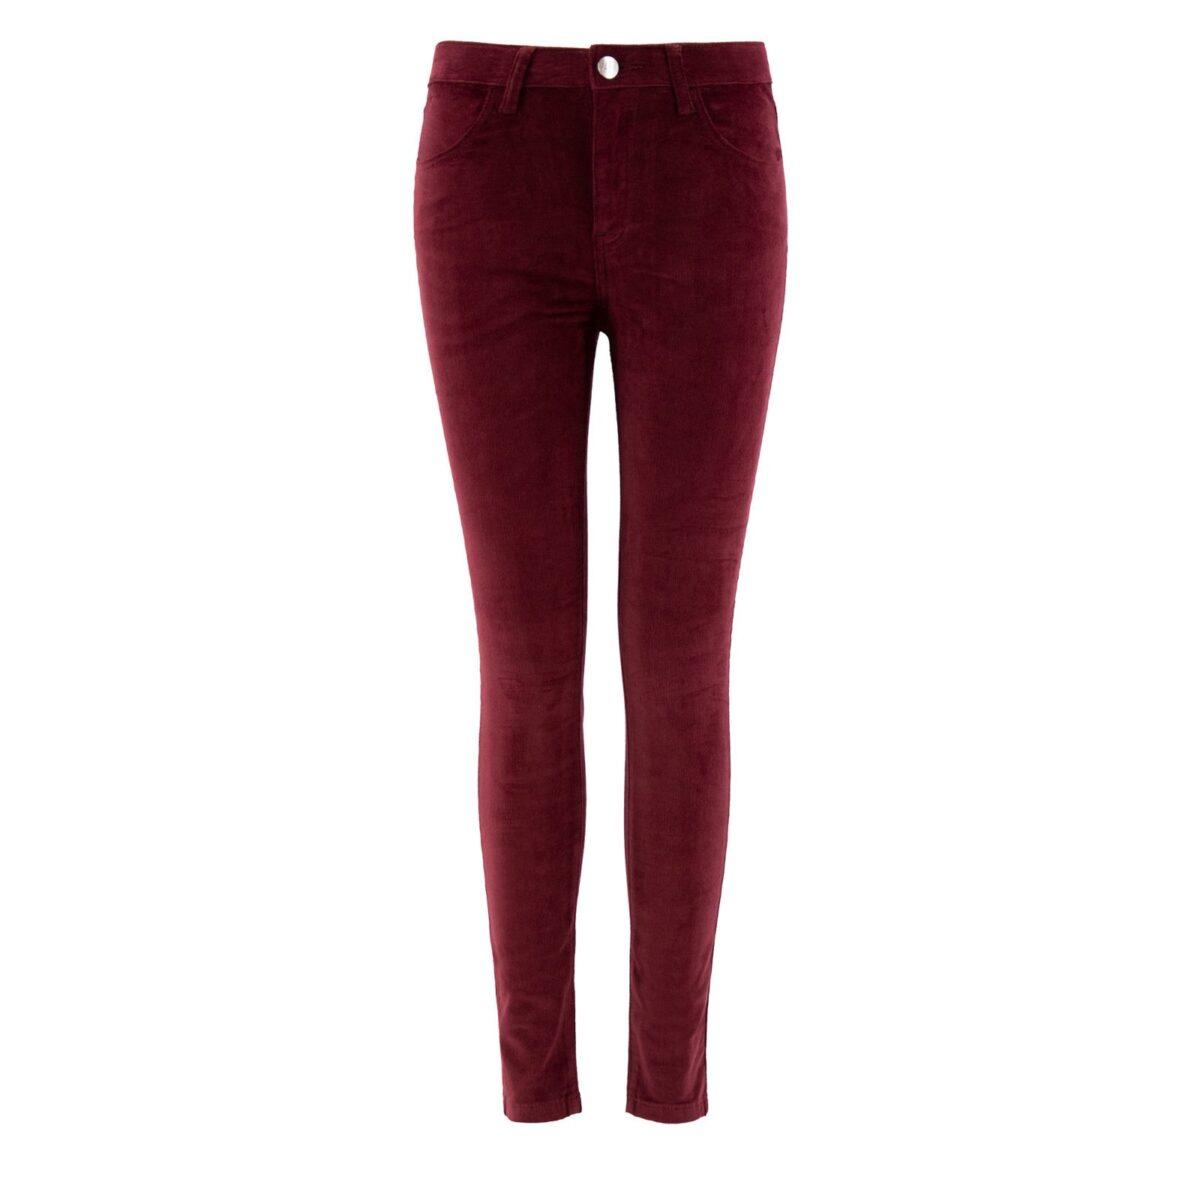 Pantalone Skinny in velluto a costine BORDEAUX - vista frontale | Nicla